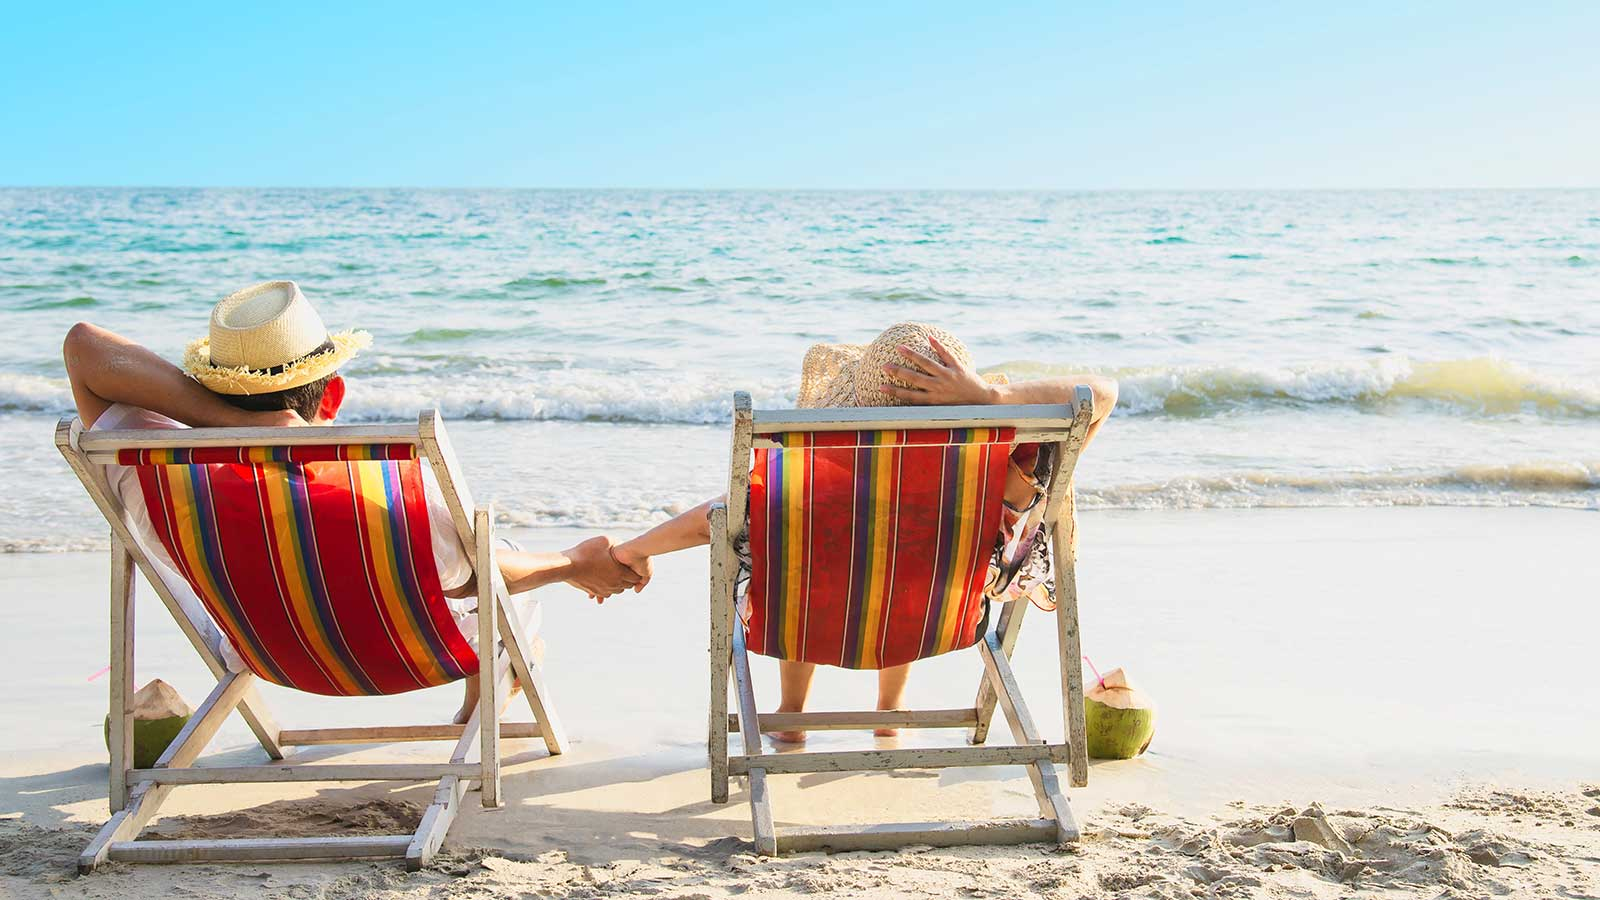 bonus vacanze 2020: foto di due persone in spiaggia in estate